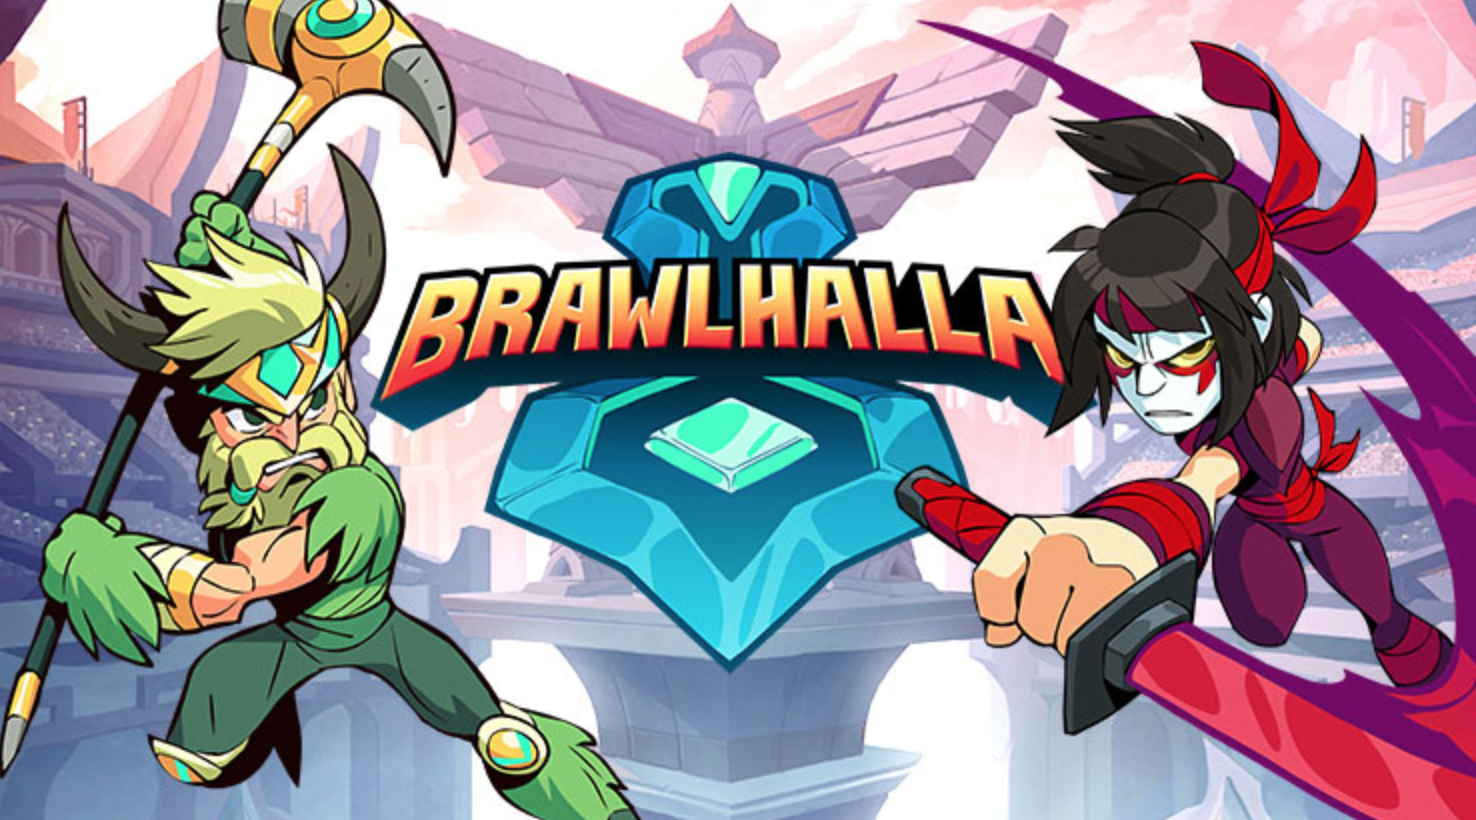 game multiplayer brawlhalla